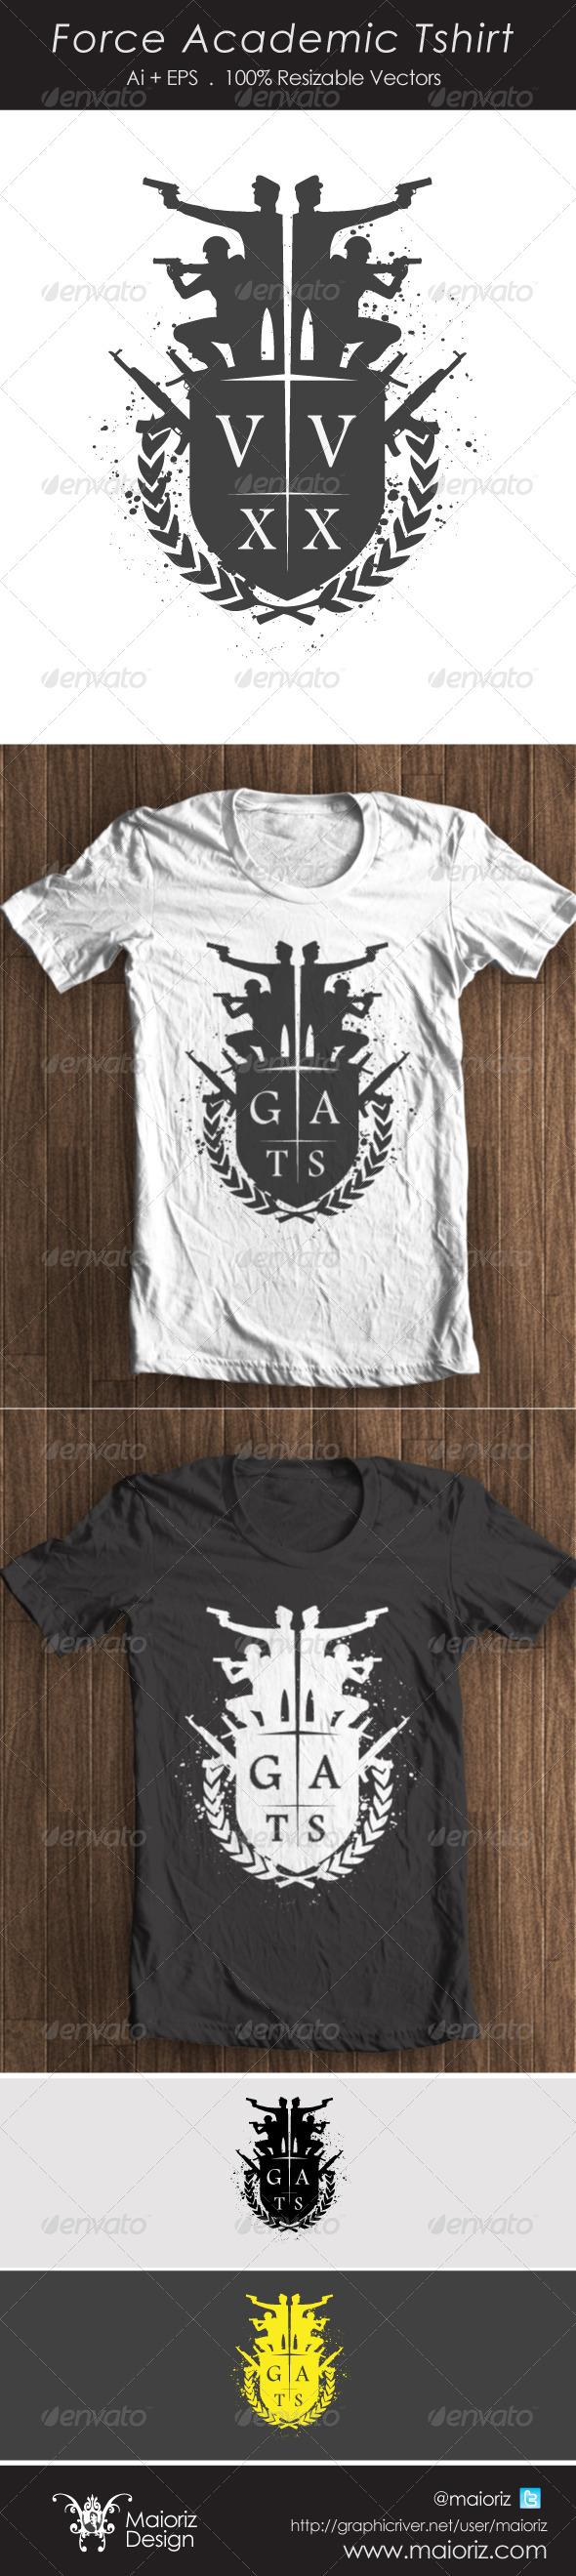 Acedemic Force Tshirt - T-Shirts